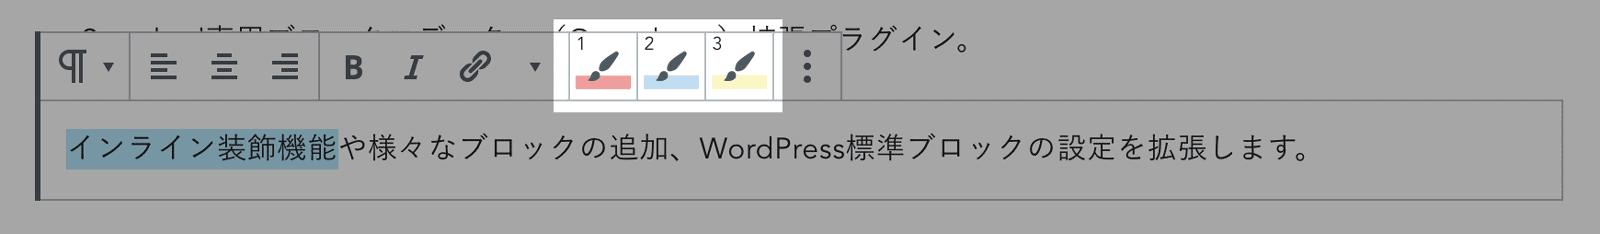 yStandard Blocksのインライン装飾ボタン